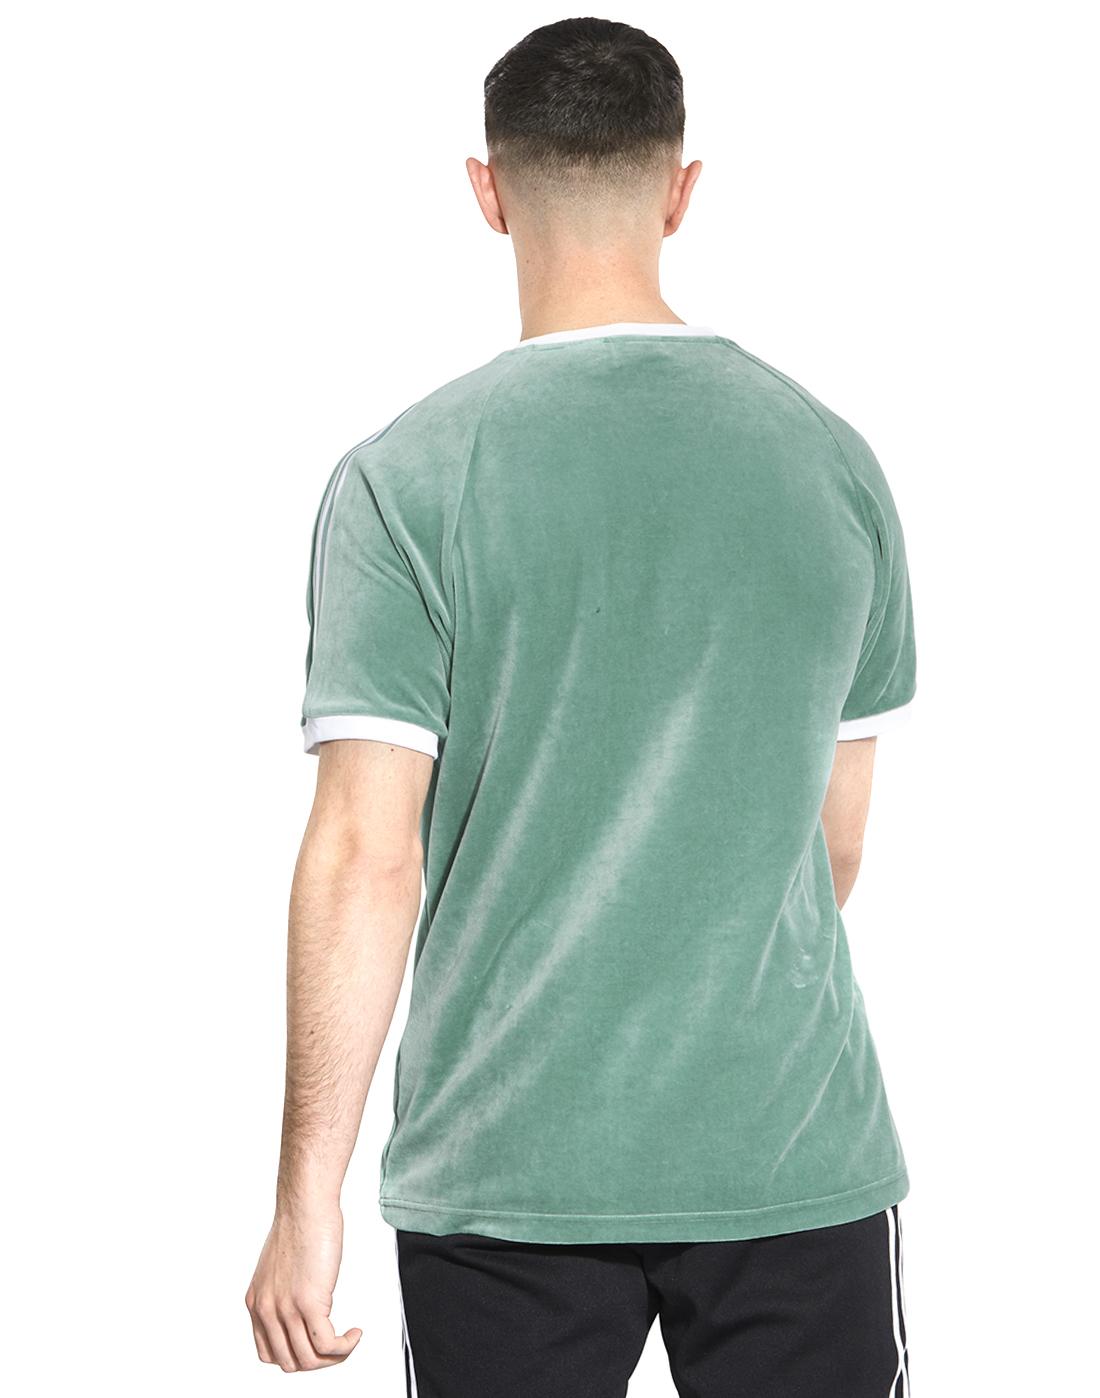 2aeedb86 Men's Green Cozy adidas Originals T-Shirt | Life Style Sports